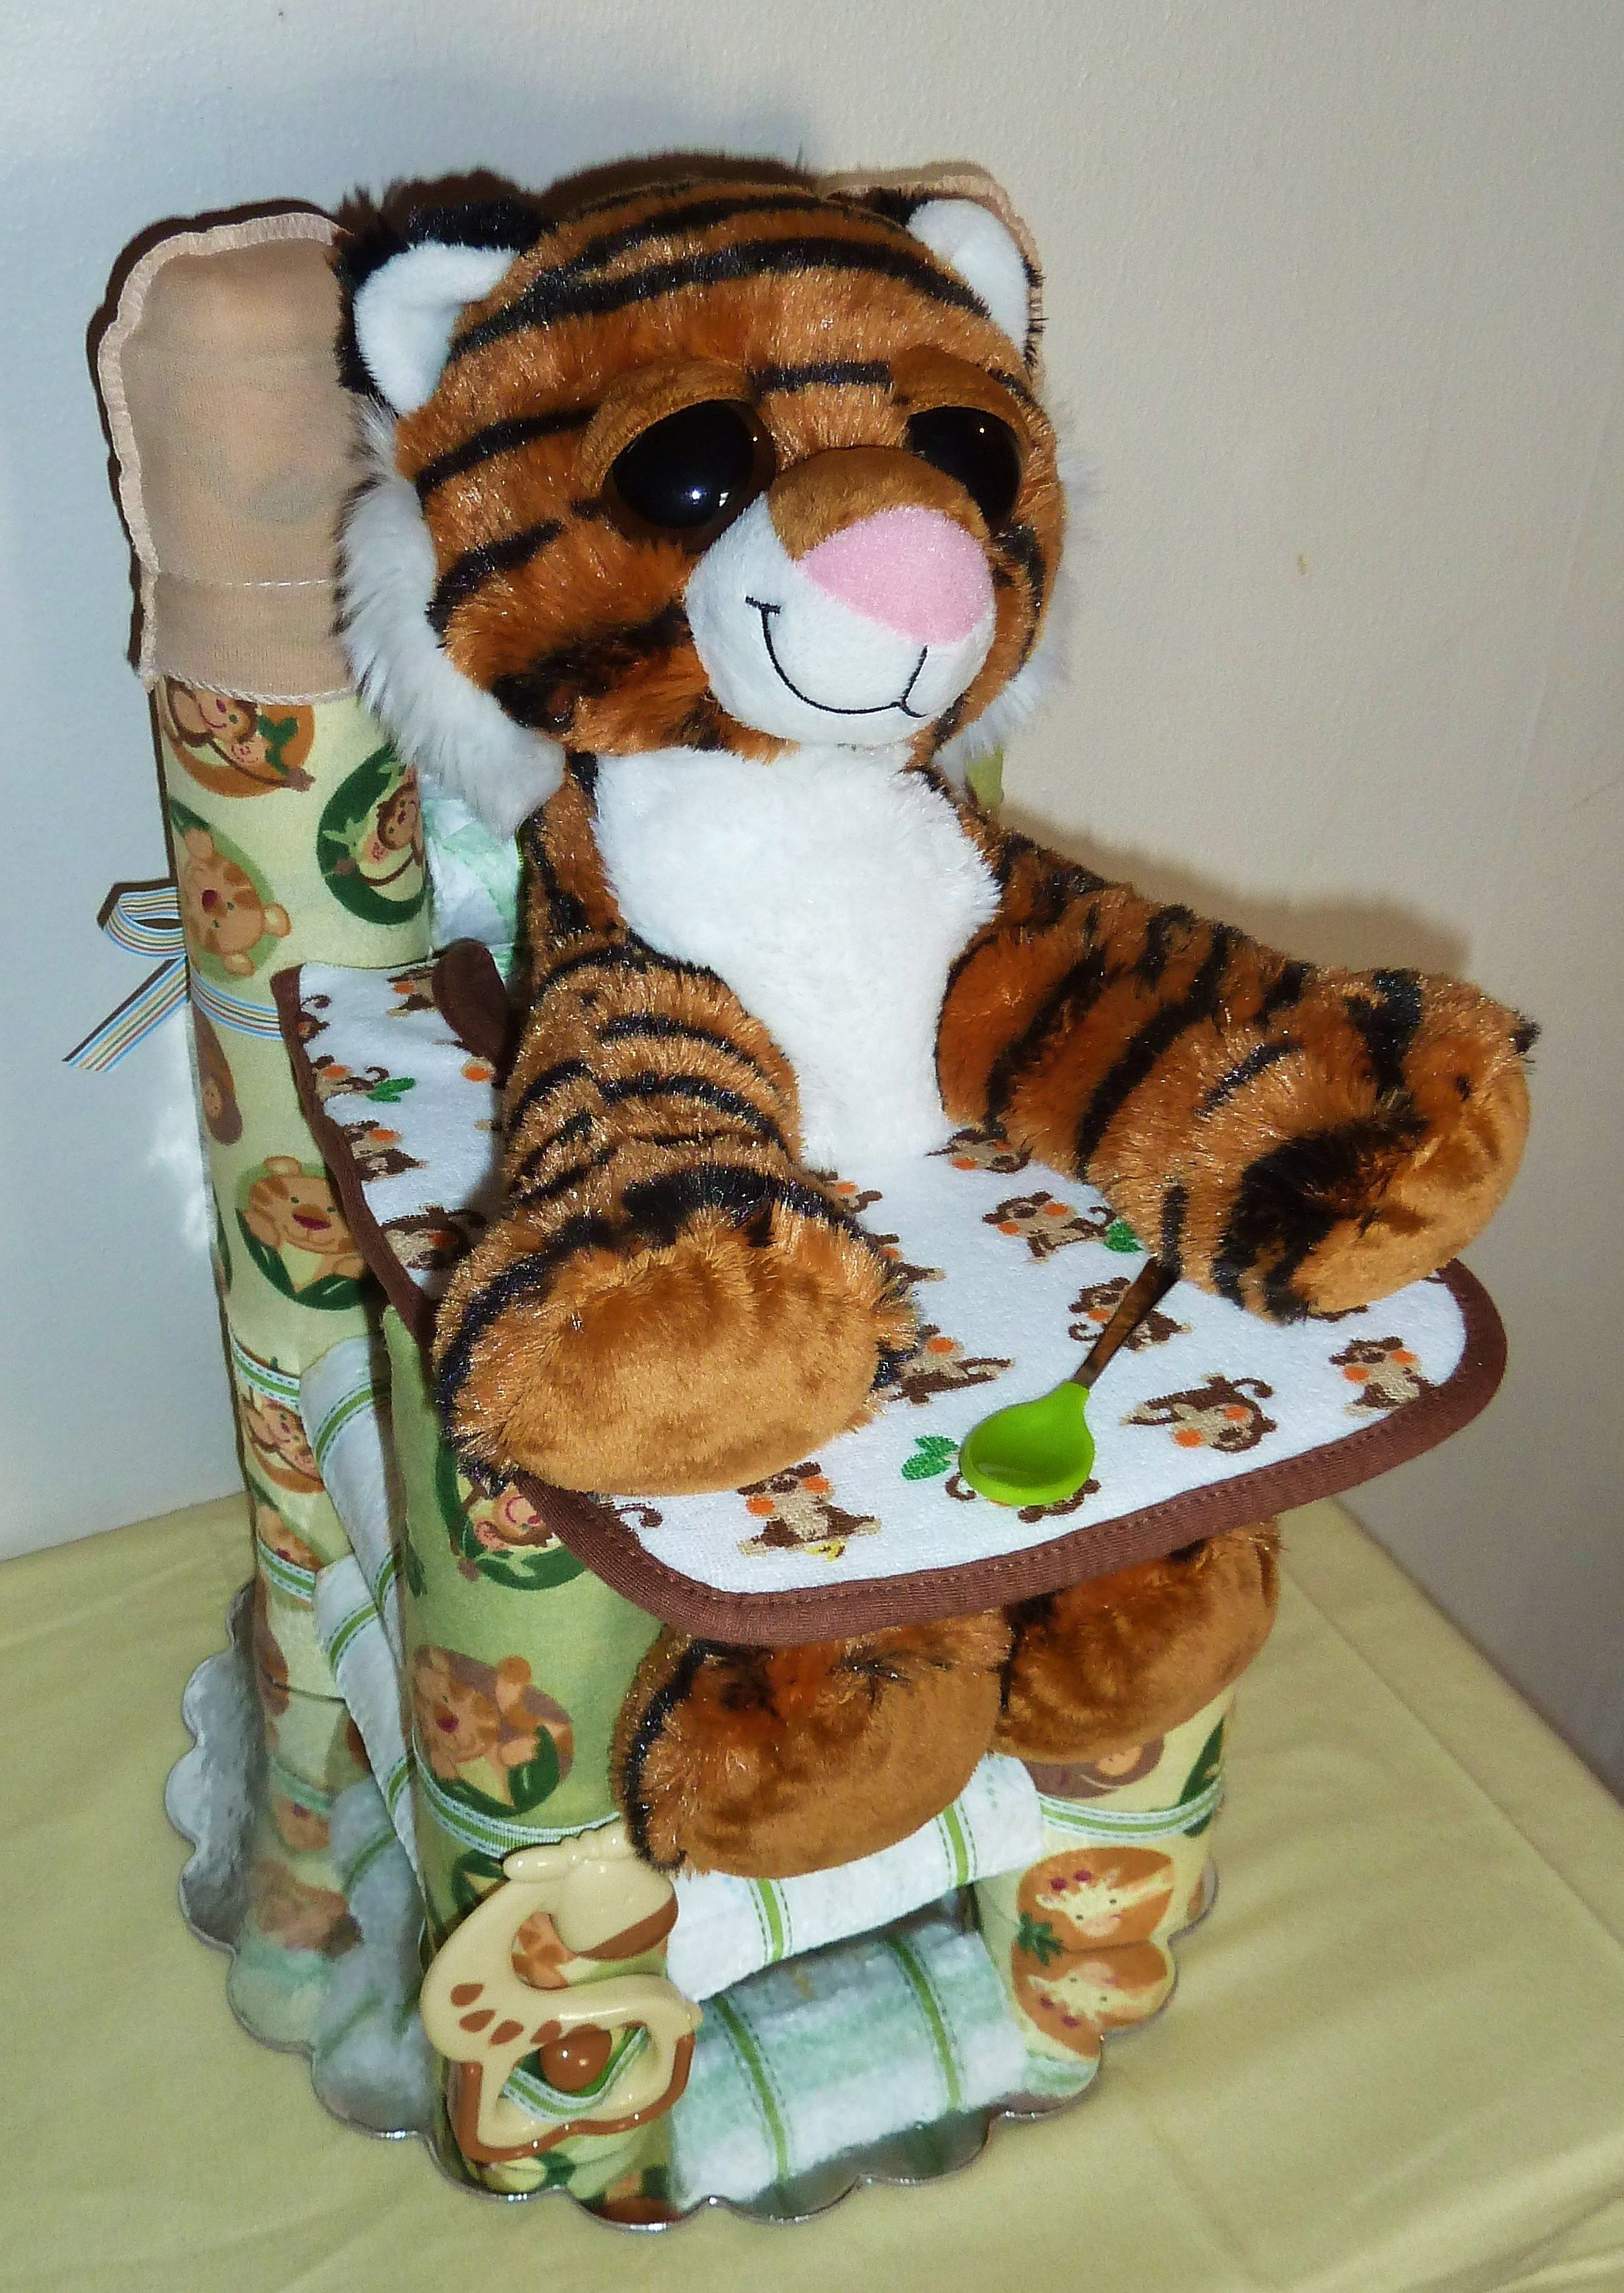 safari high chair fishing game for sale diaper neutral etsy shop